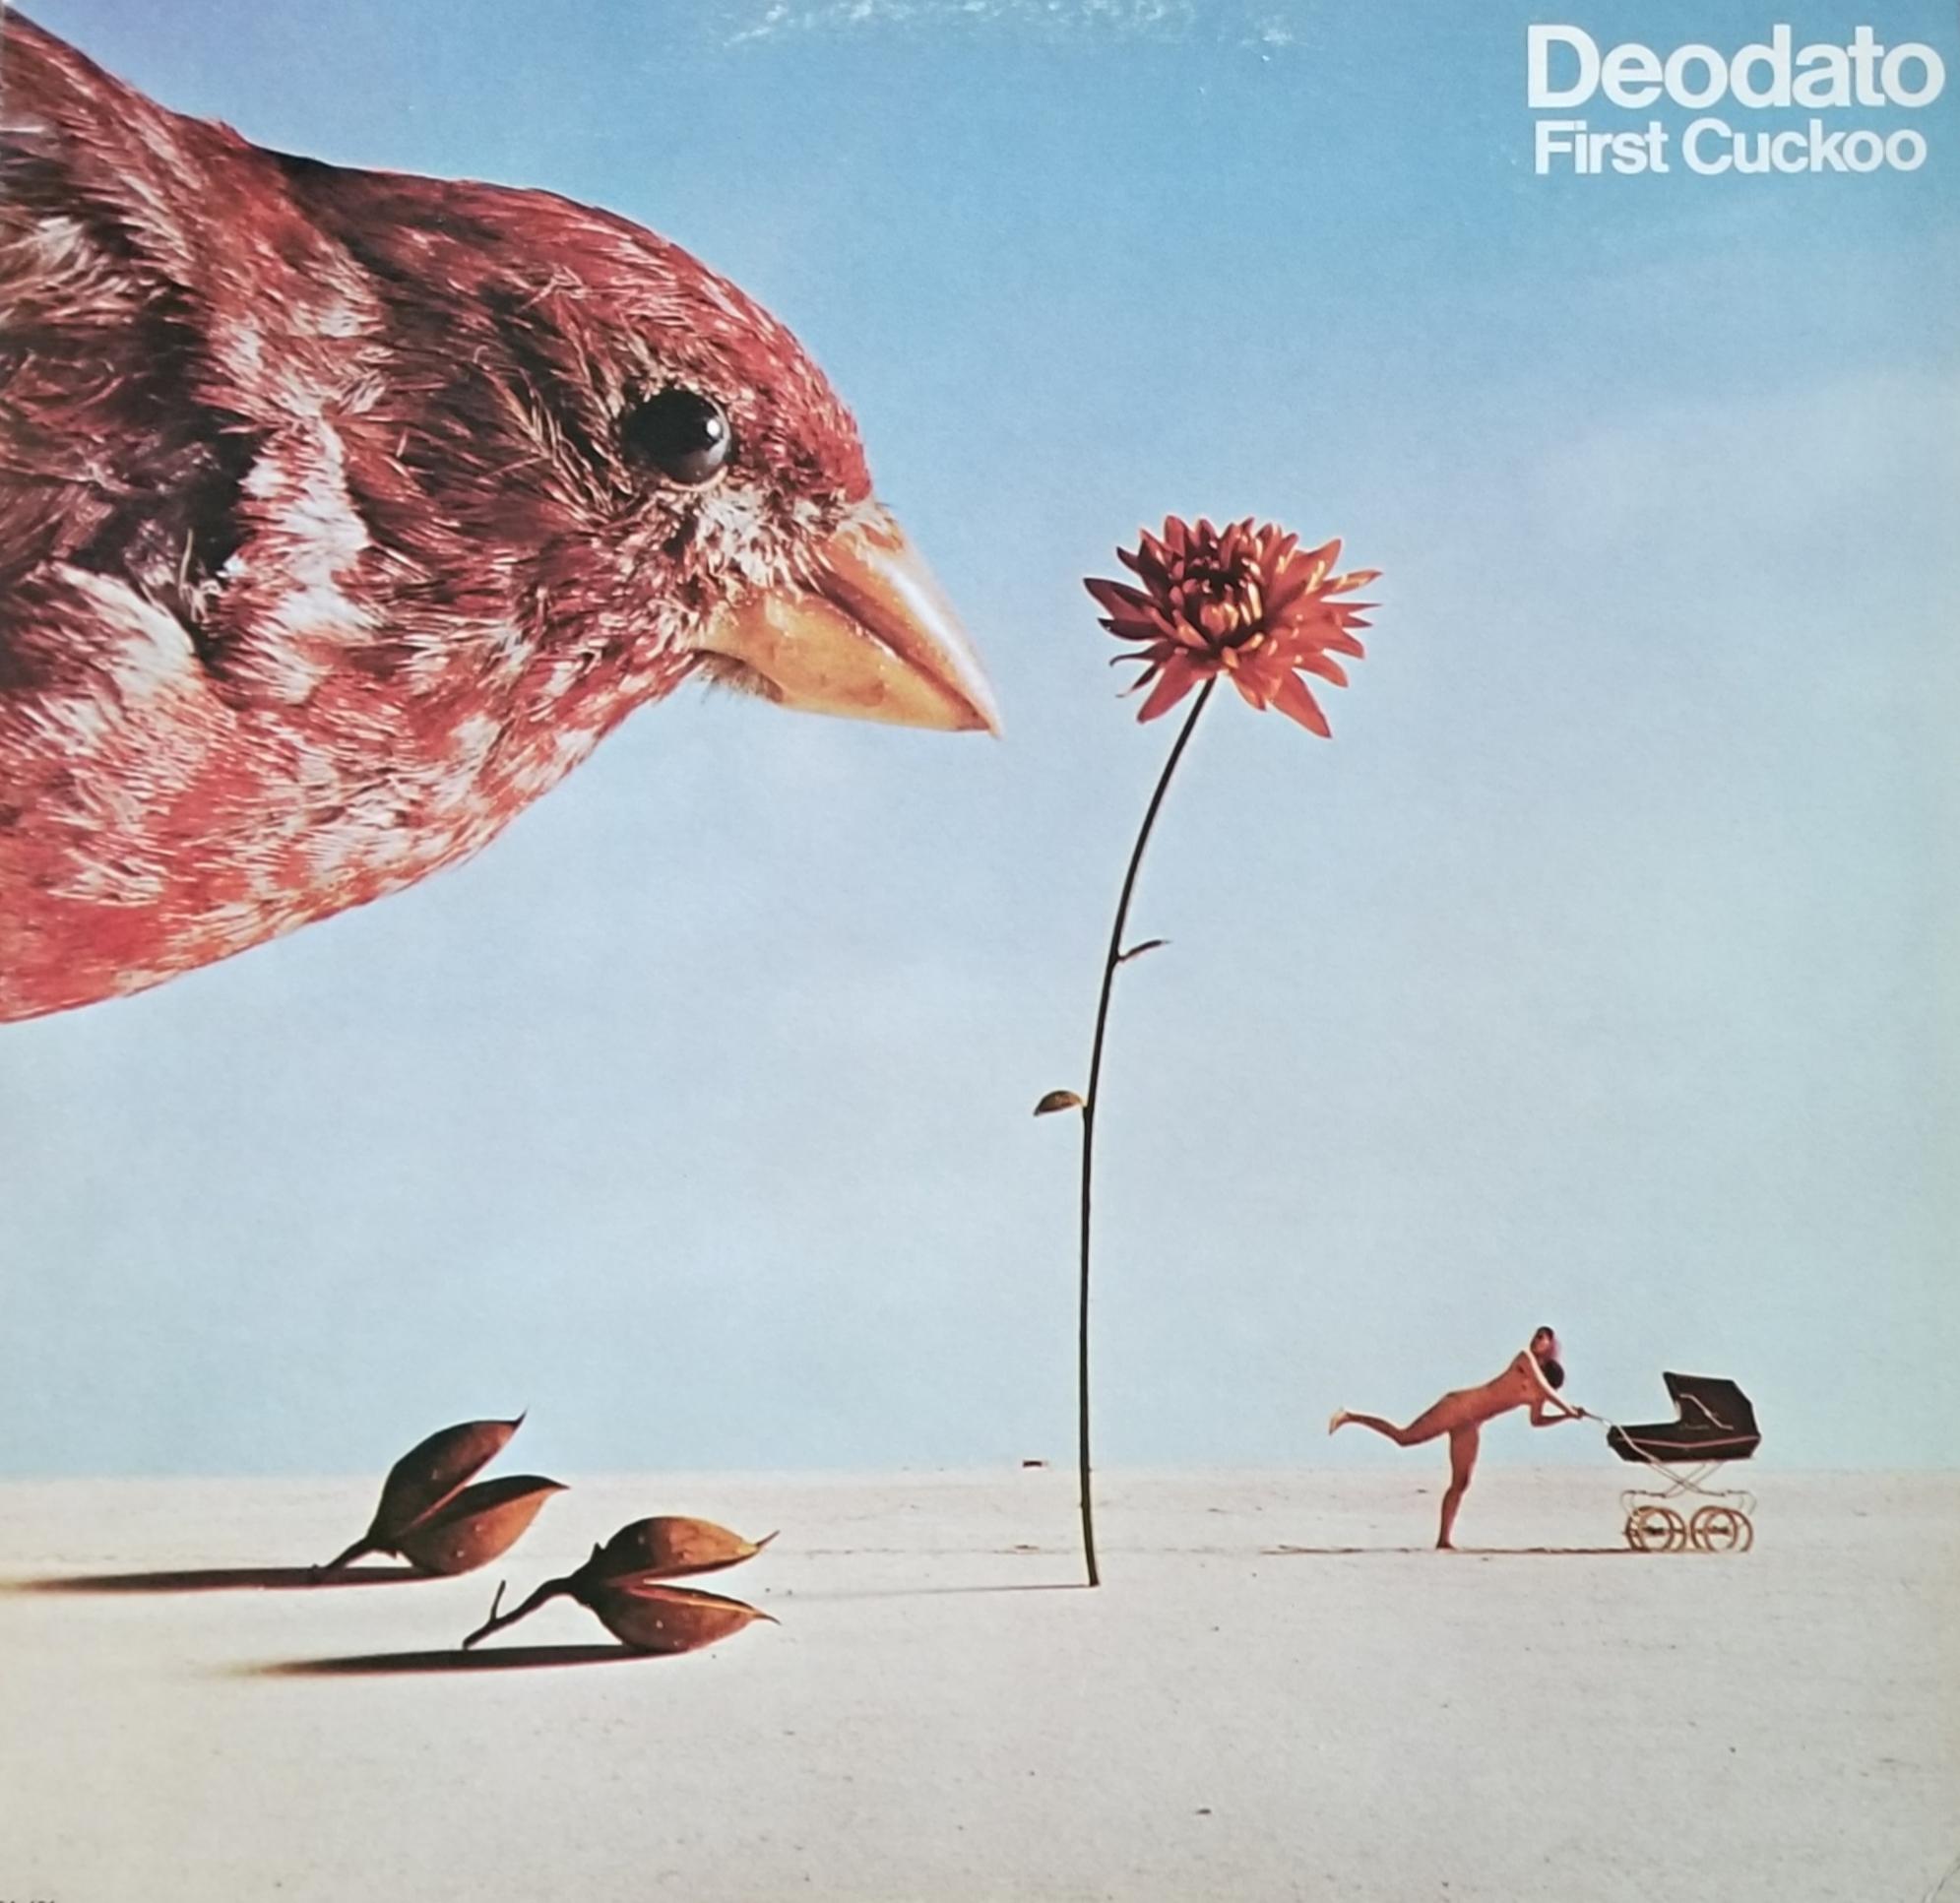 Sampleworthy: - Deodato, First Cuckoo